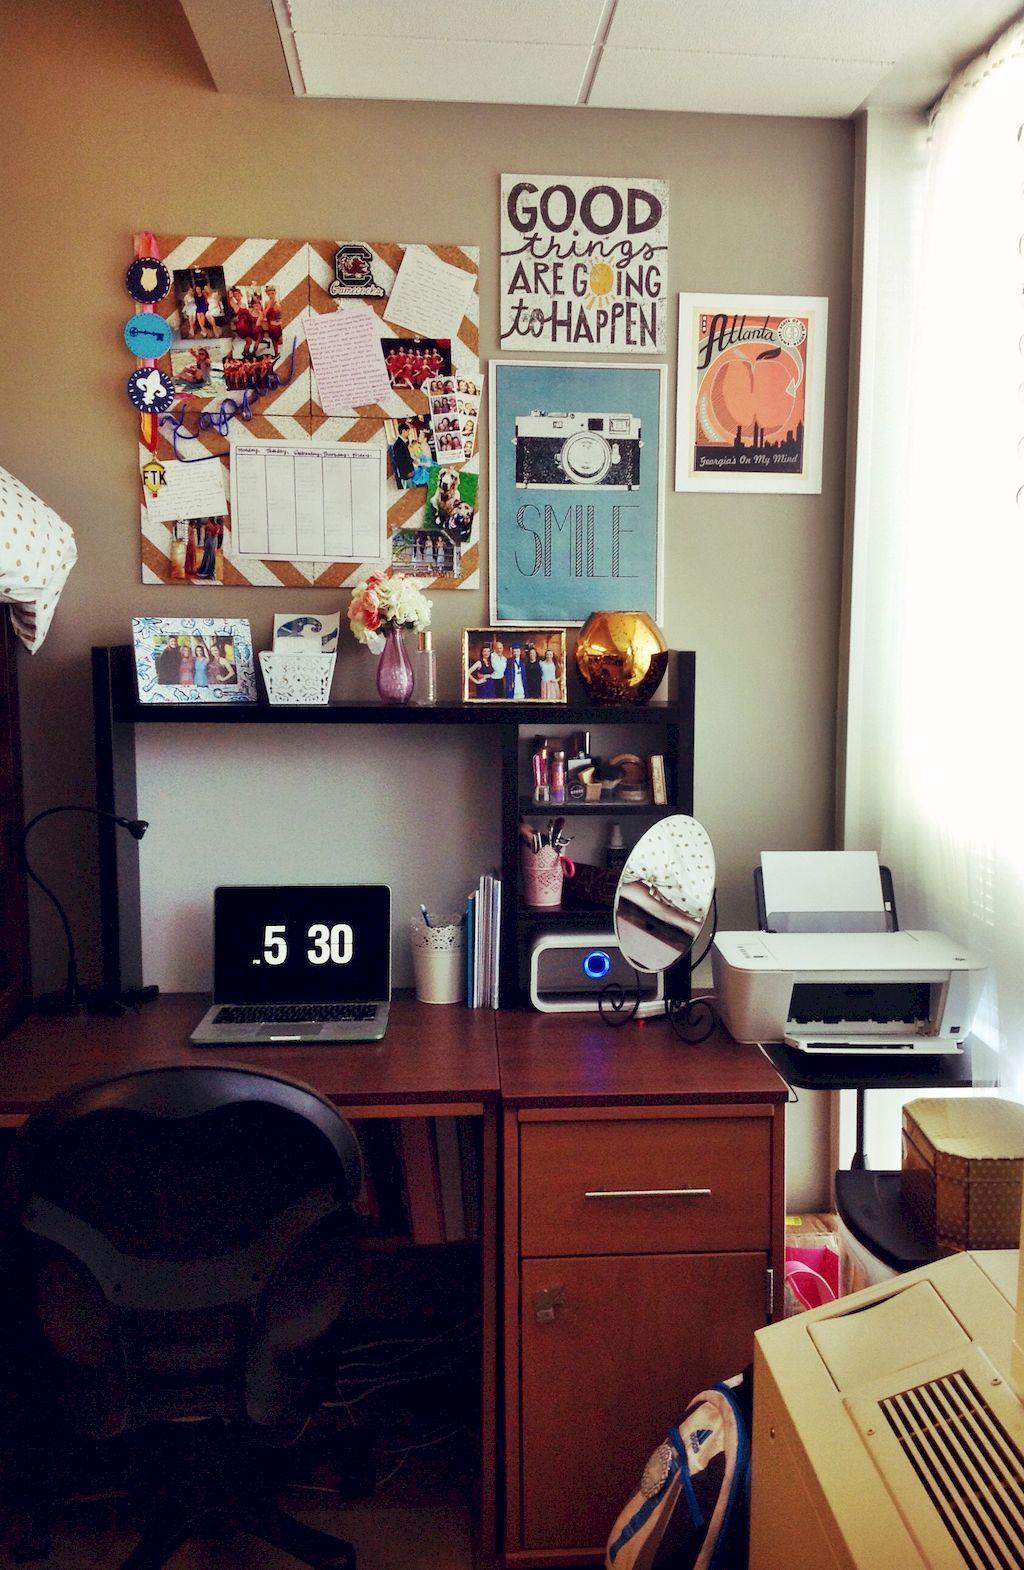 Cool 65 Clever Dorm Room Organization Decoration Ideas Https Homearchite Com 2017 08 15 65 Clever Dorm Room Orga Dorm Room Desk College Dorm Desk Dorm Desk